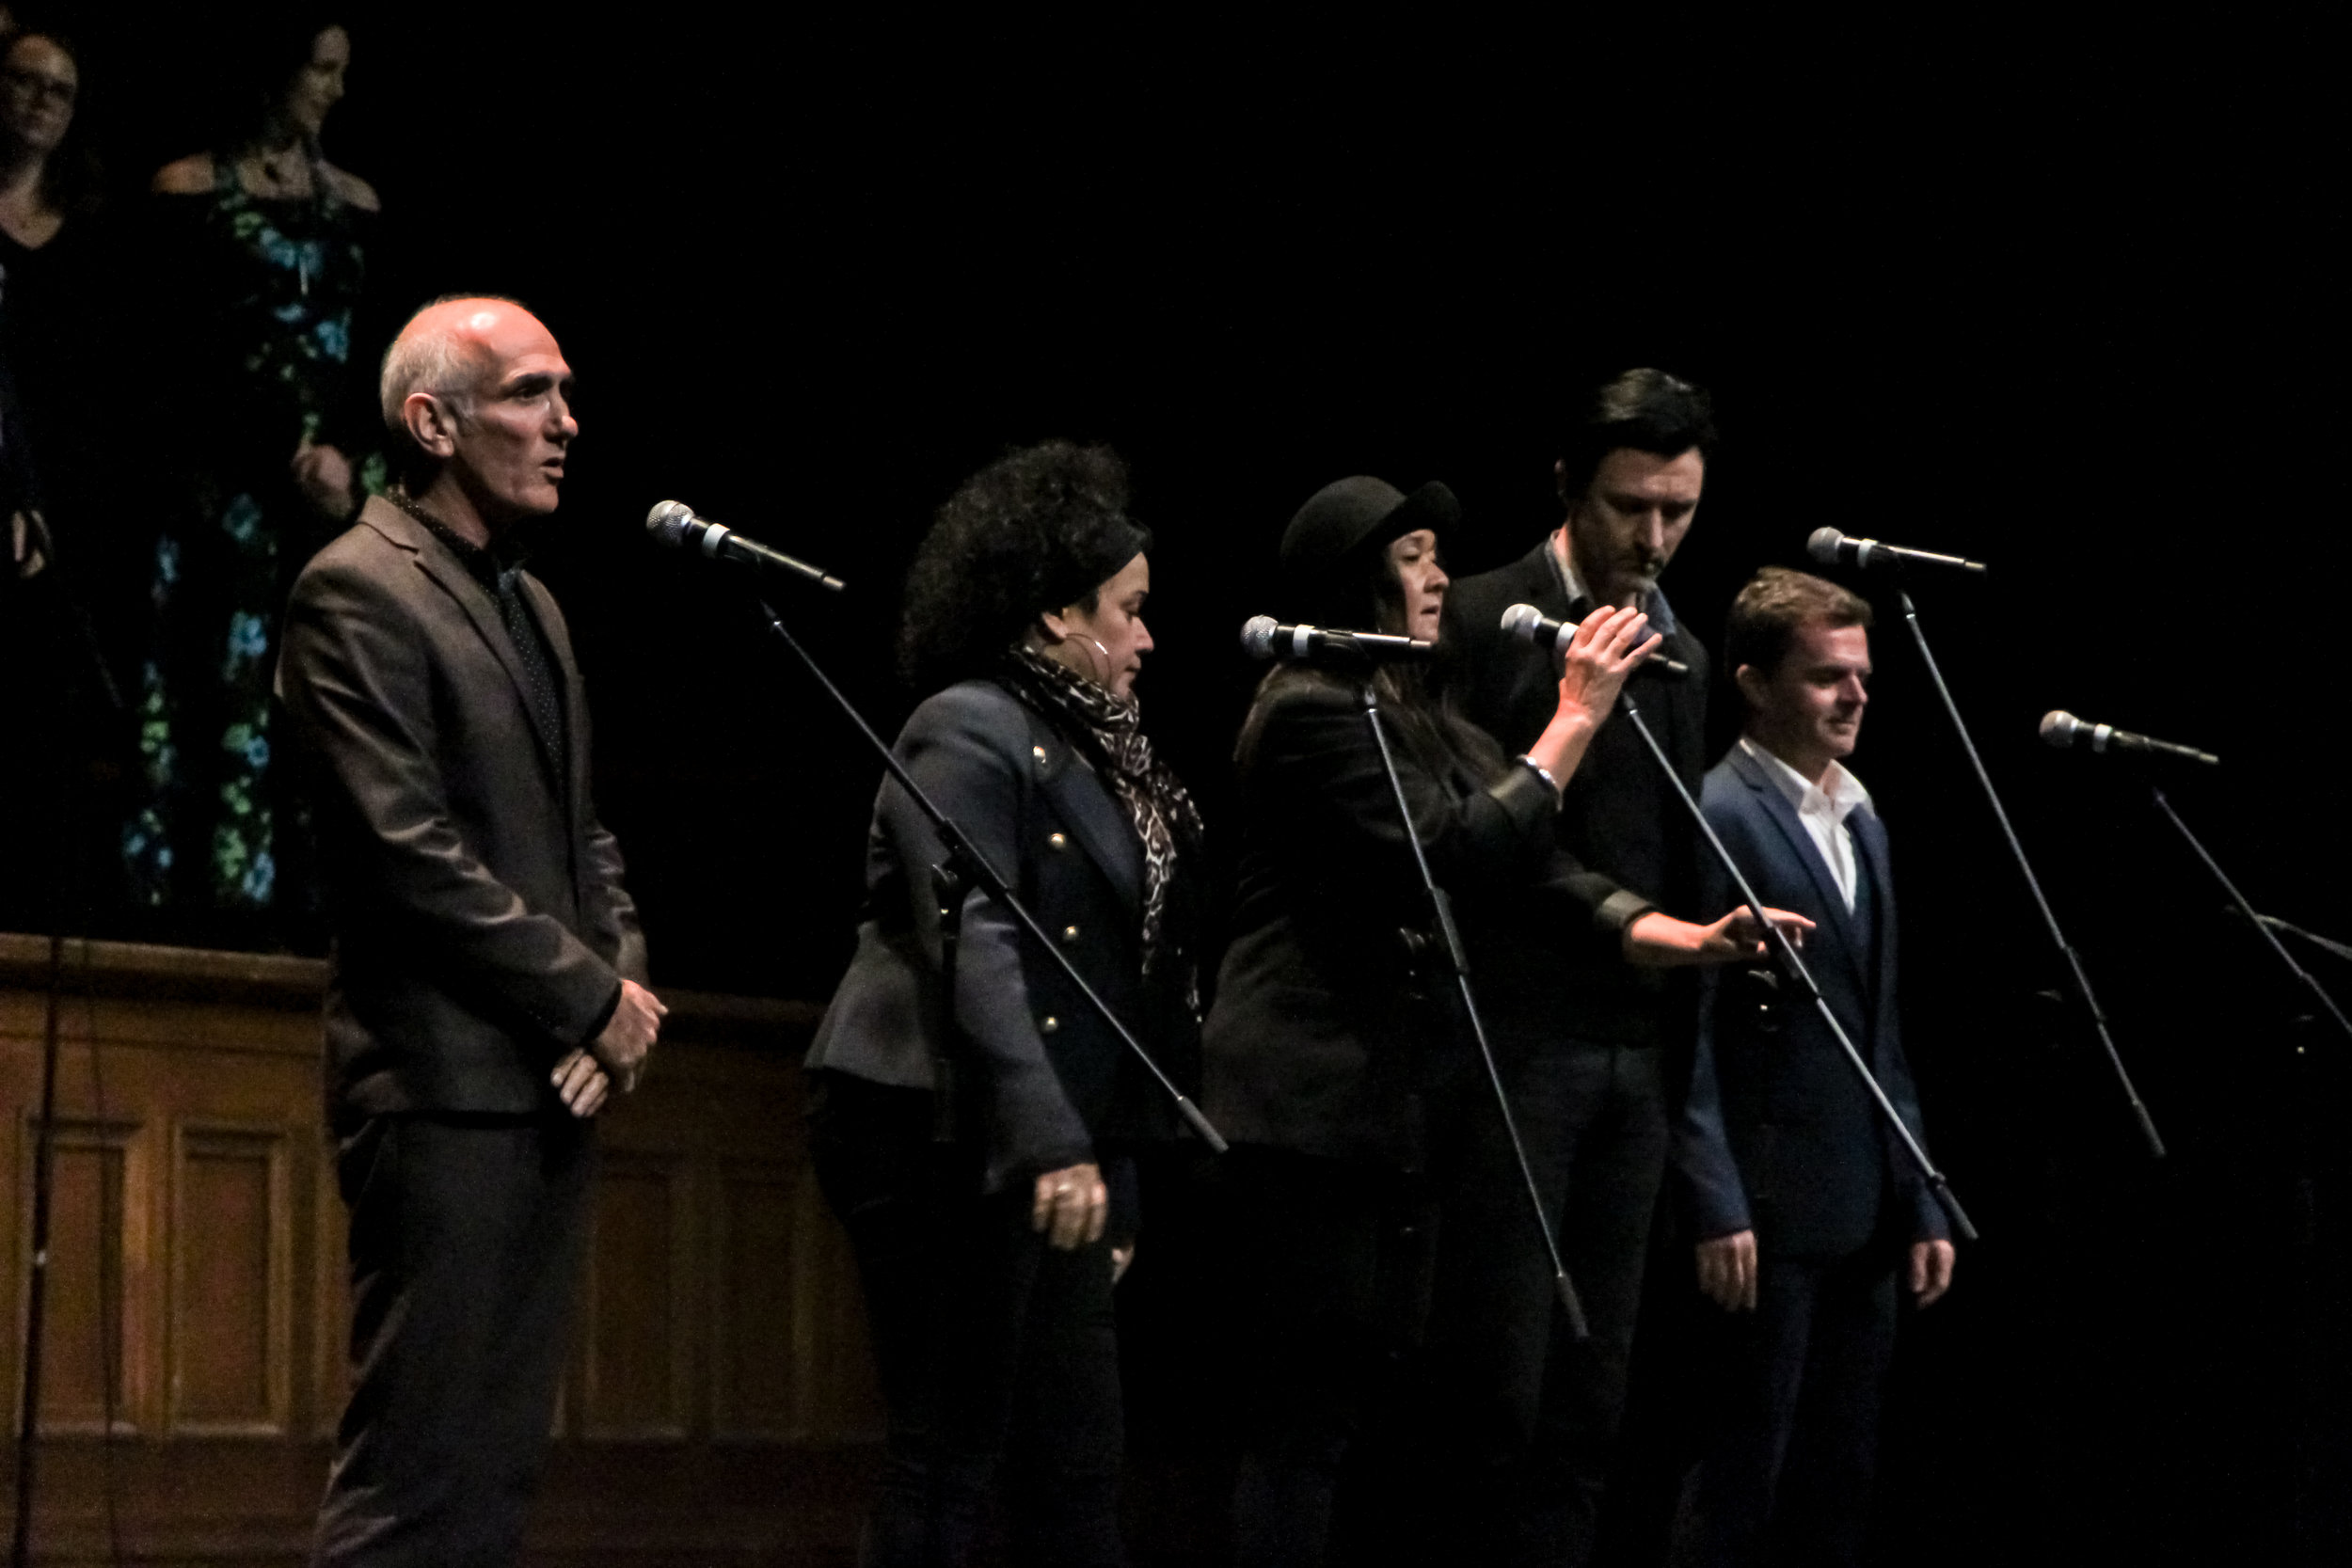 Paul Kelly, Vika & Linda, Paul Dempsey & Jeremy Smih for John Clarke's Memorial